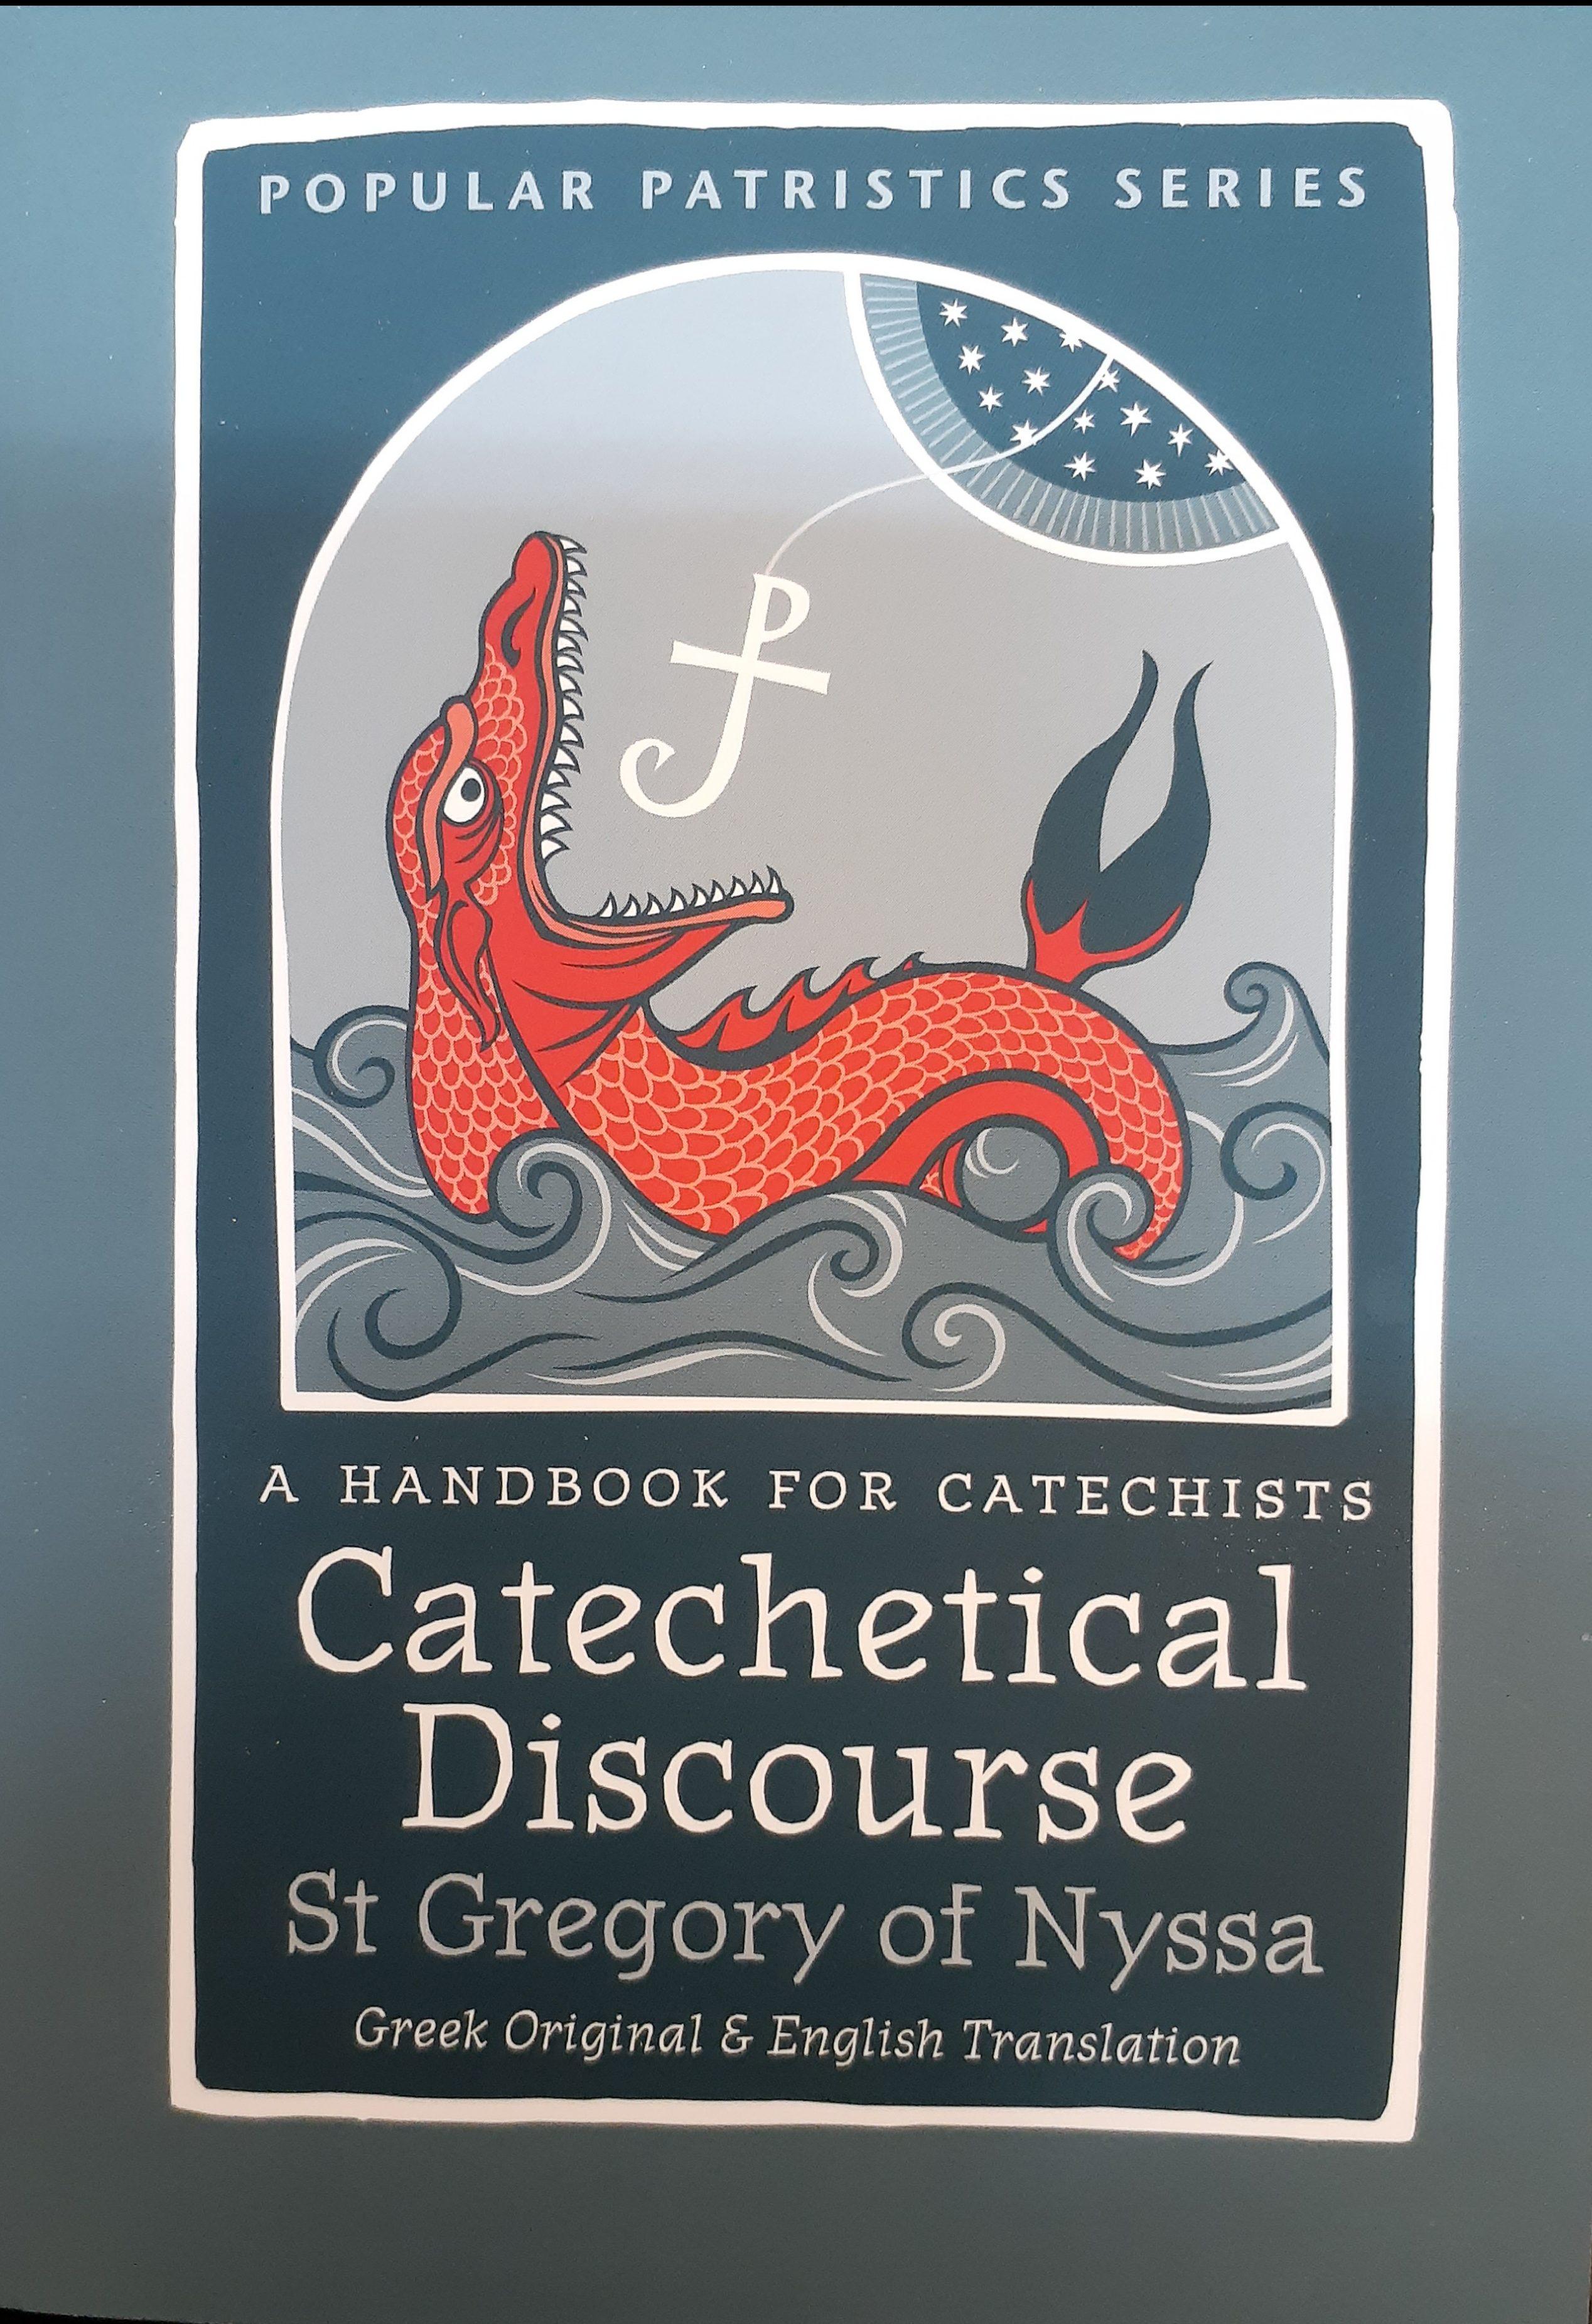 Catechetical Discourse